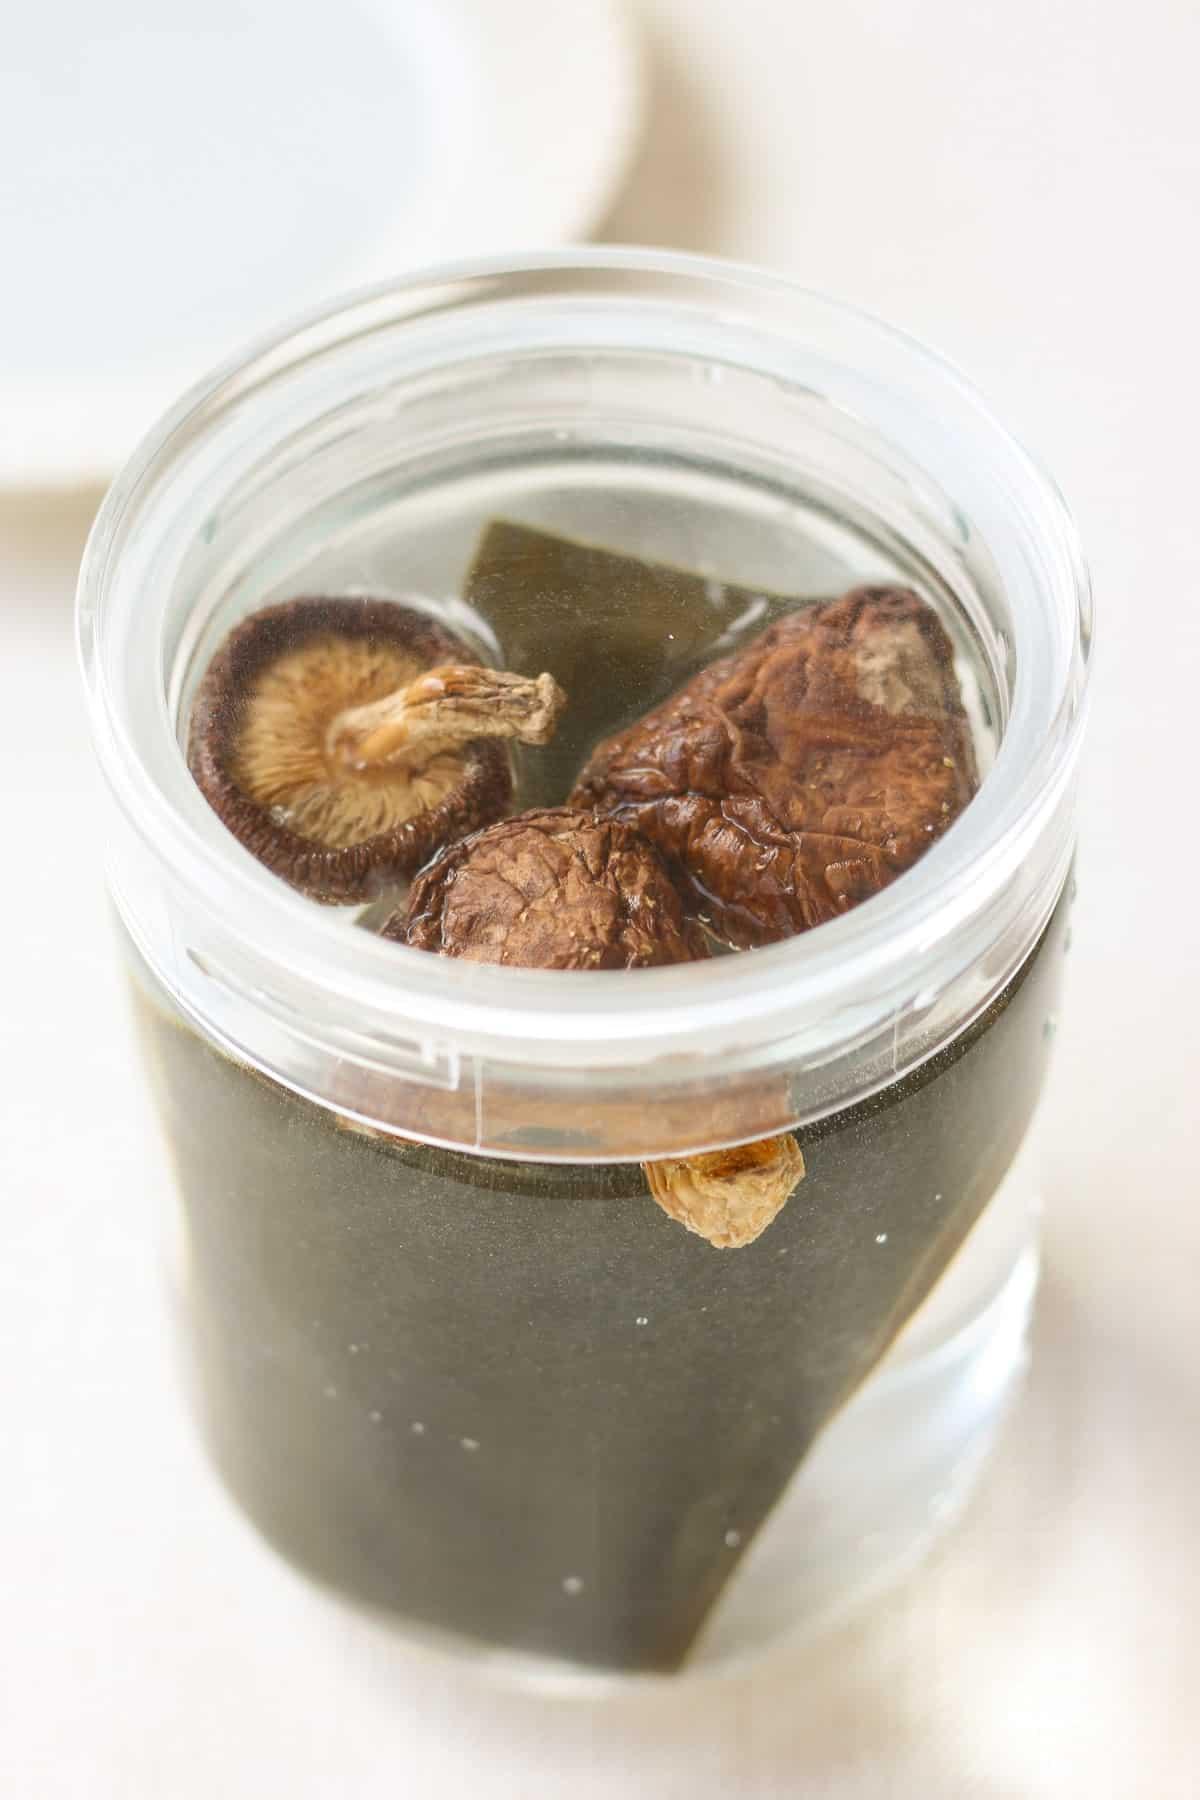 dried shiitake, kombu and water in a bottle for making dashi